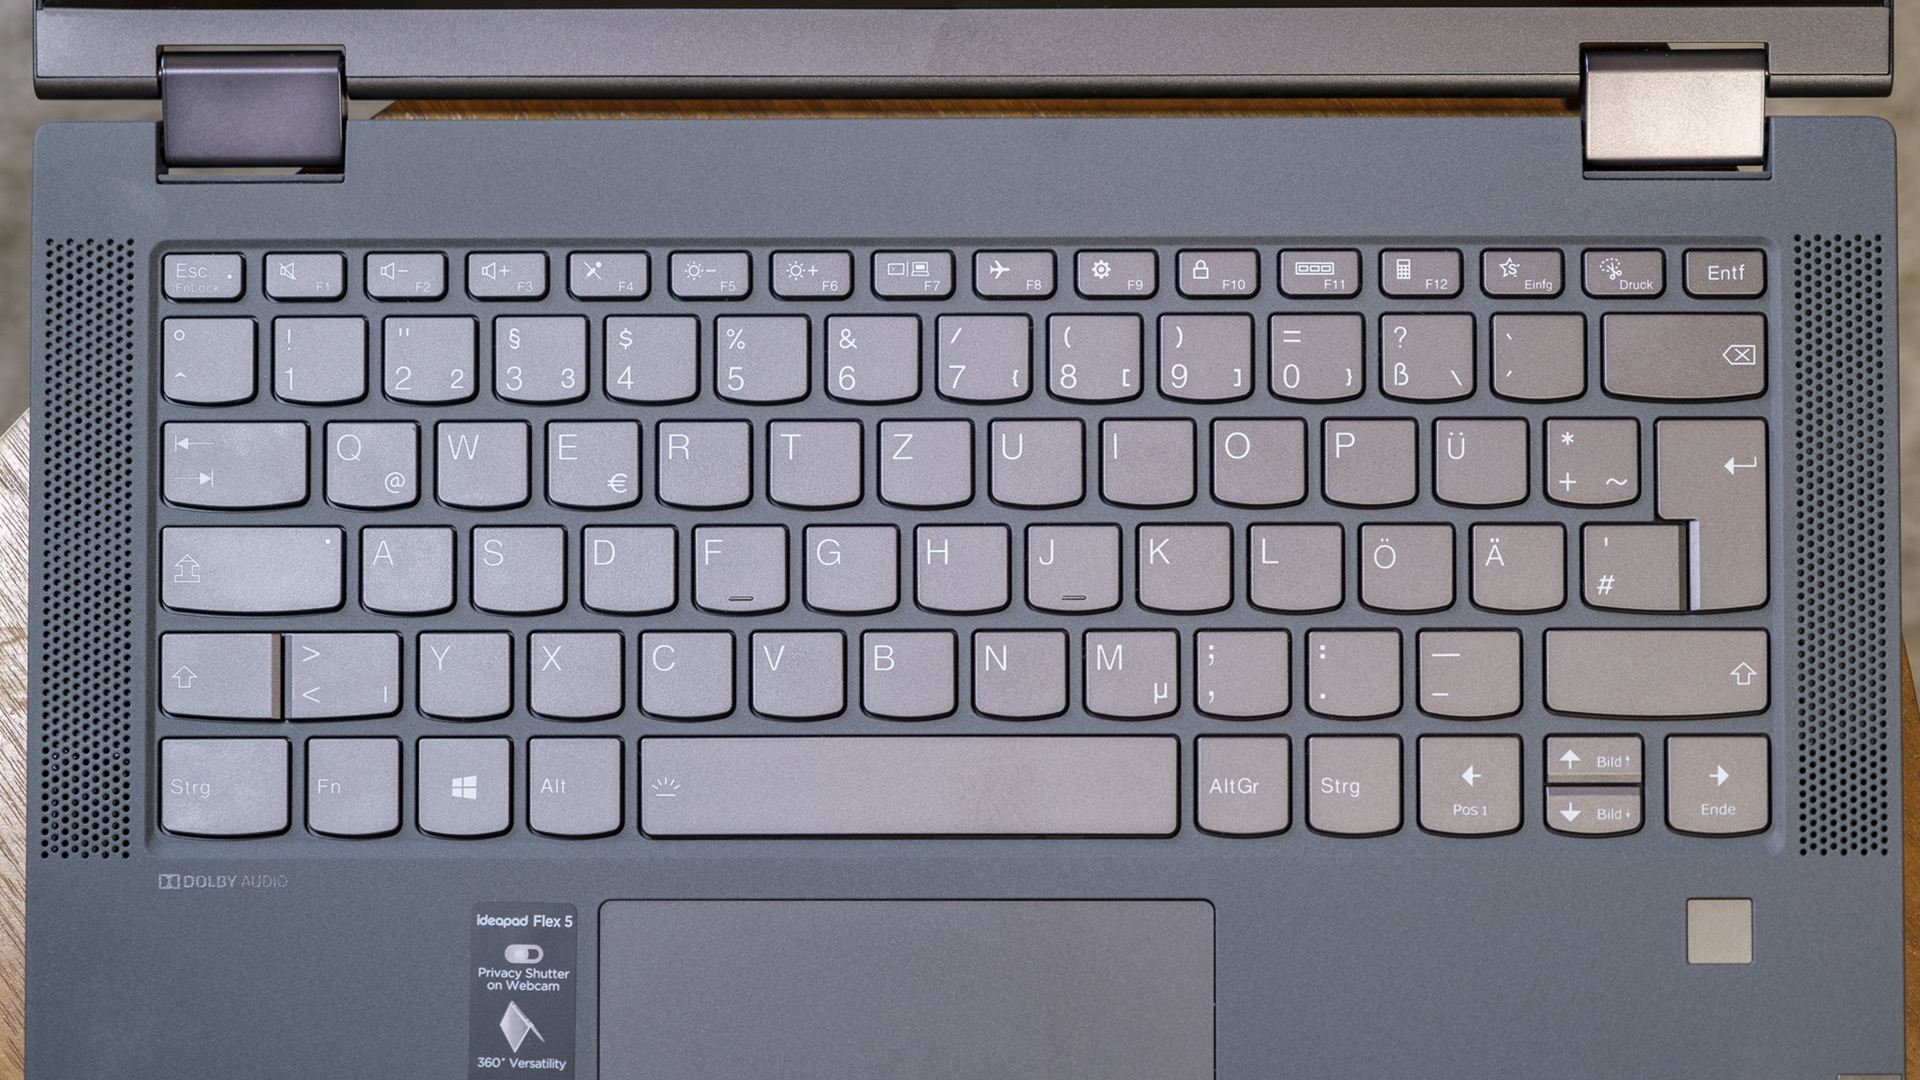 Lenovo IdeaPad Flex 5 AMD Ryzen 5700U Tastatur